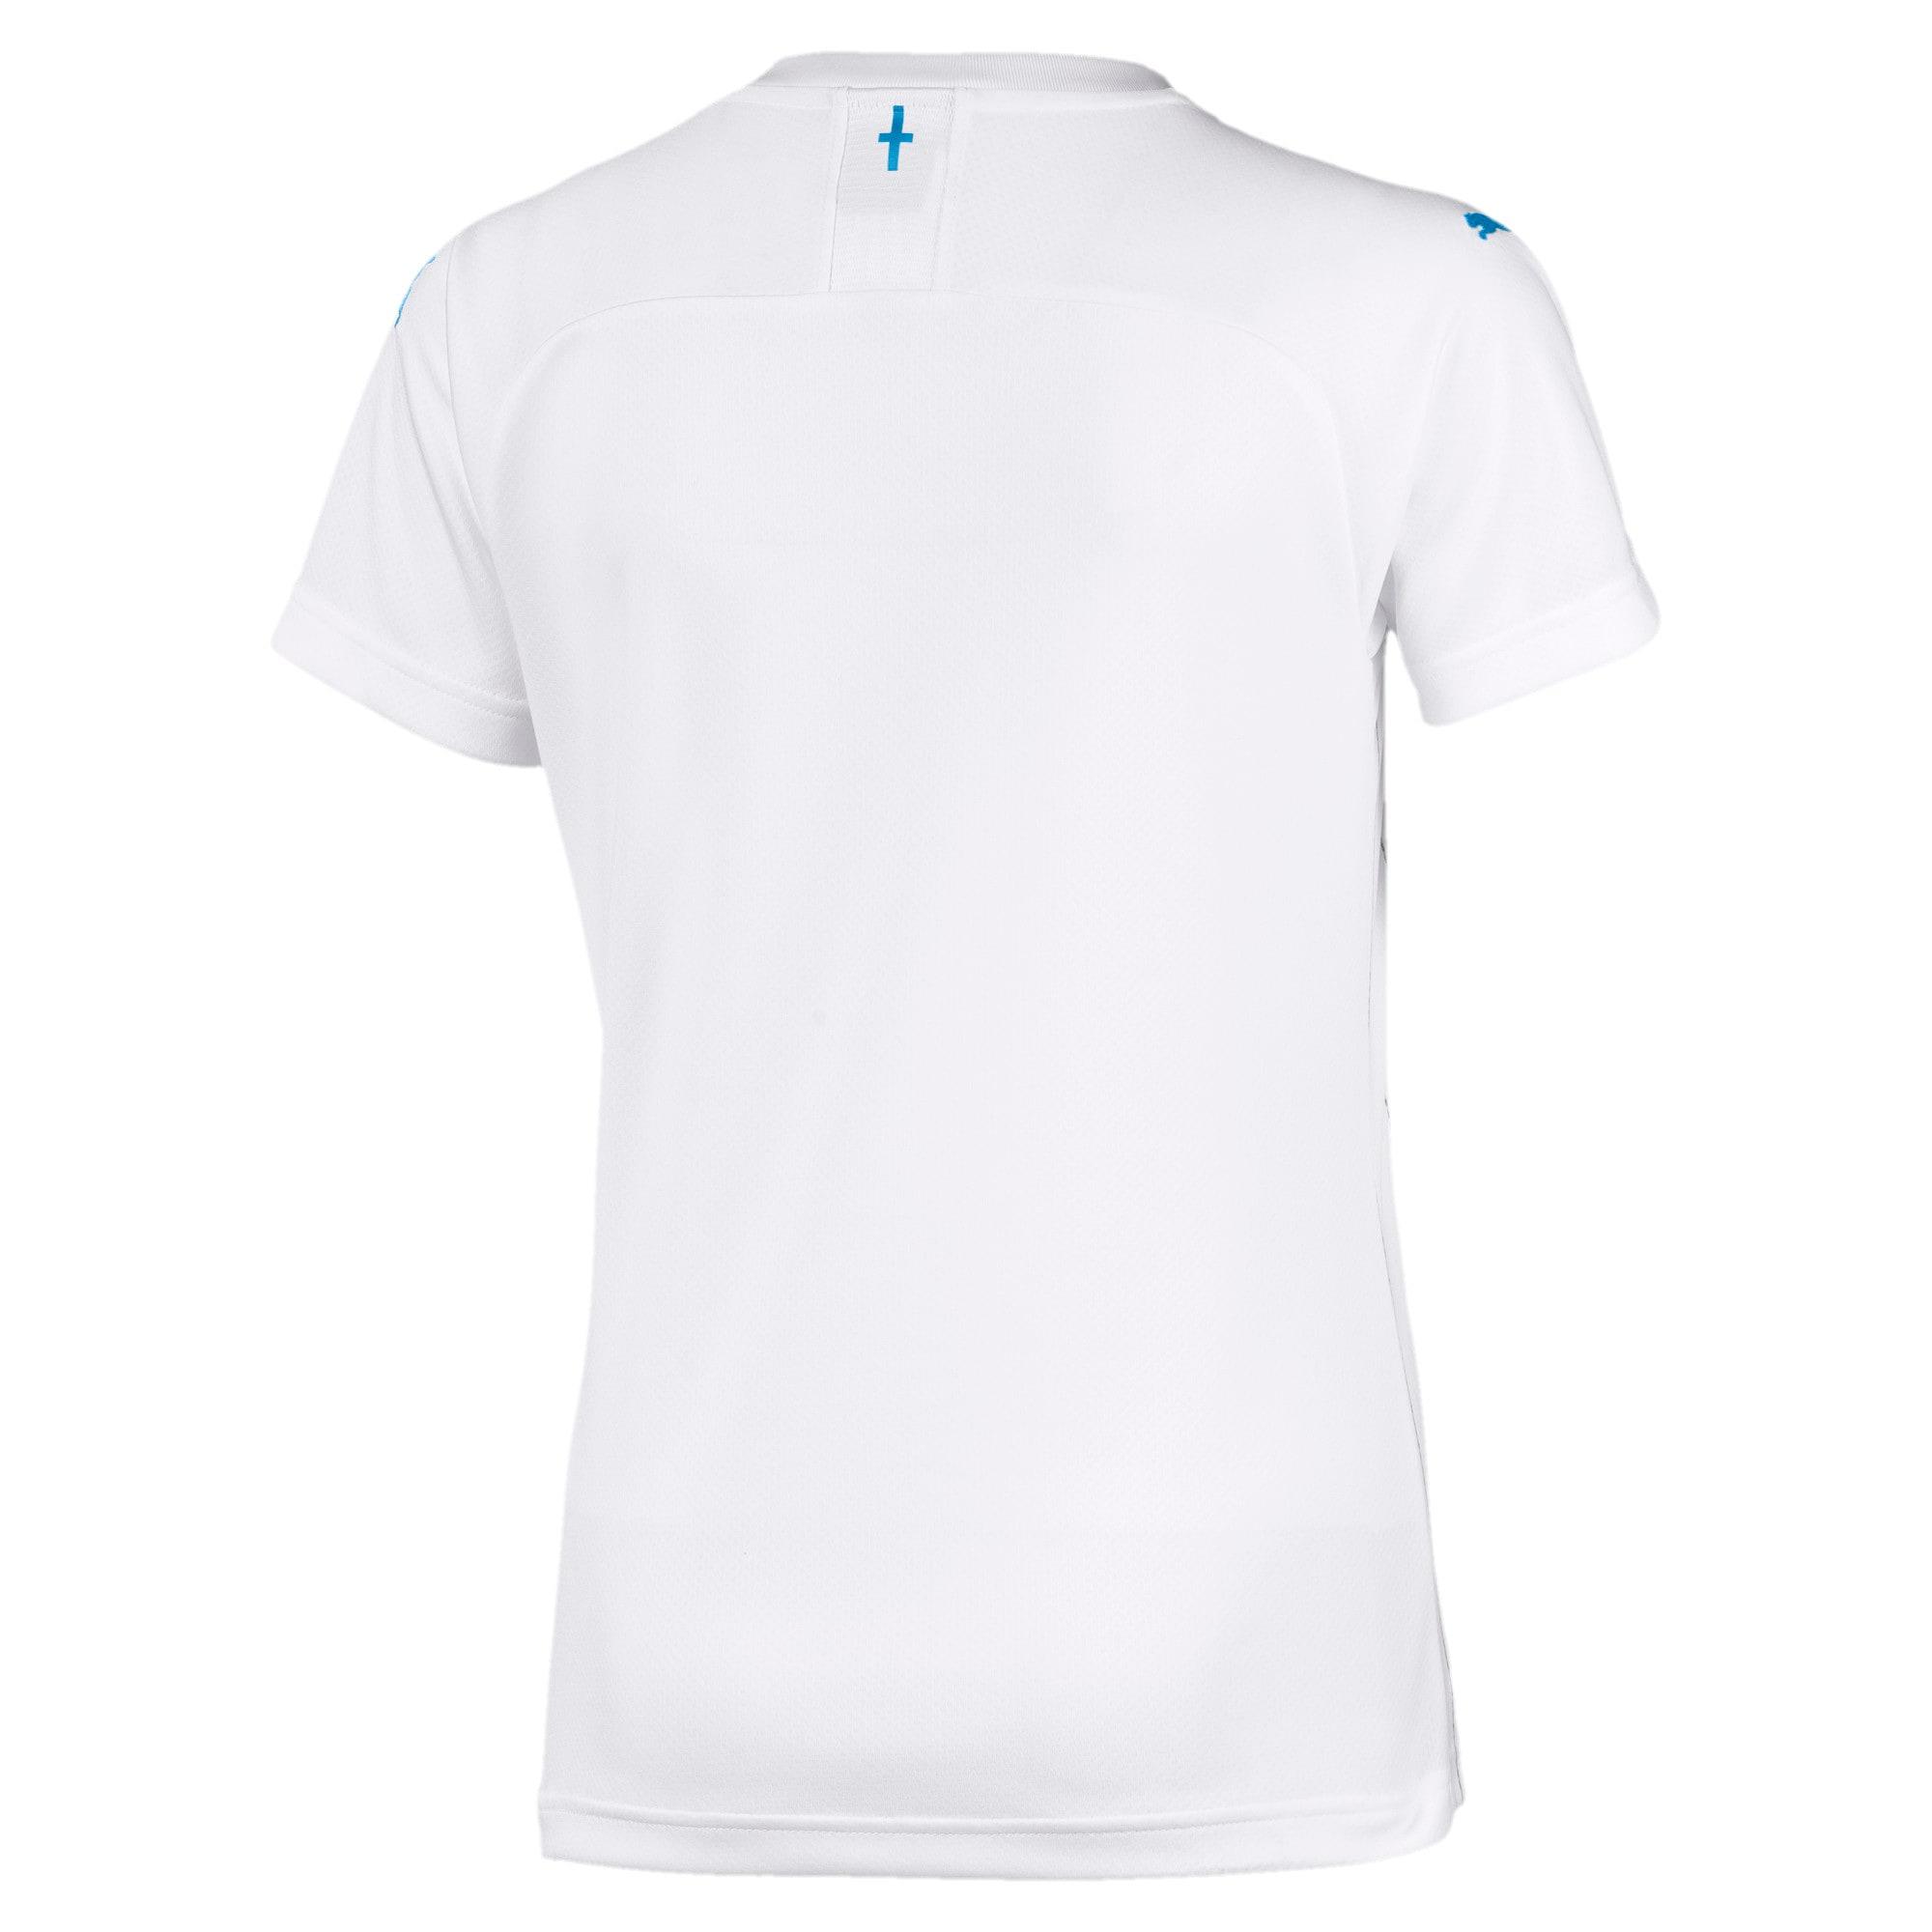 Thumbnail 2 of Olympique de Marseille Women's Home Replica Jersey, Puma White-Bleu Azur, medium